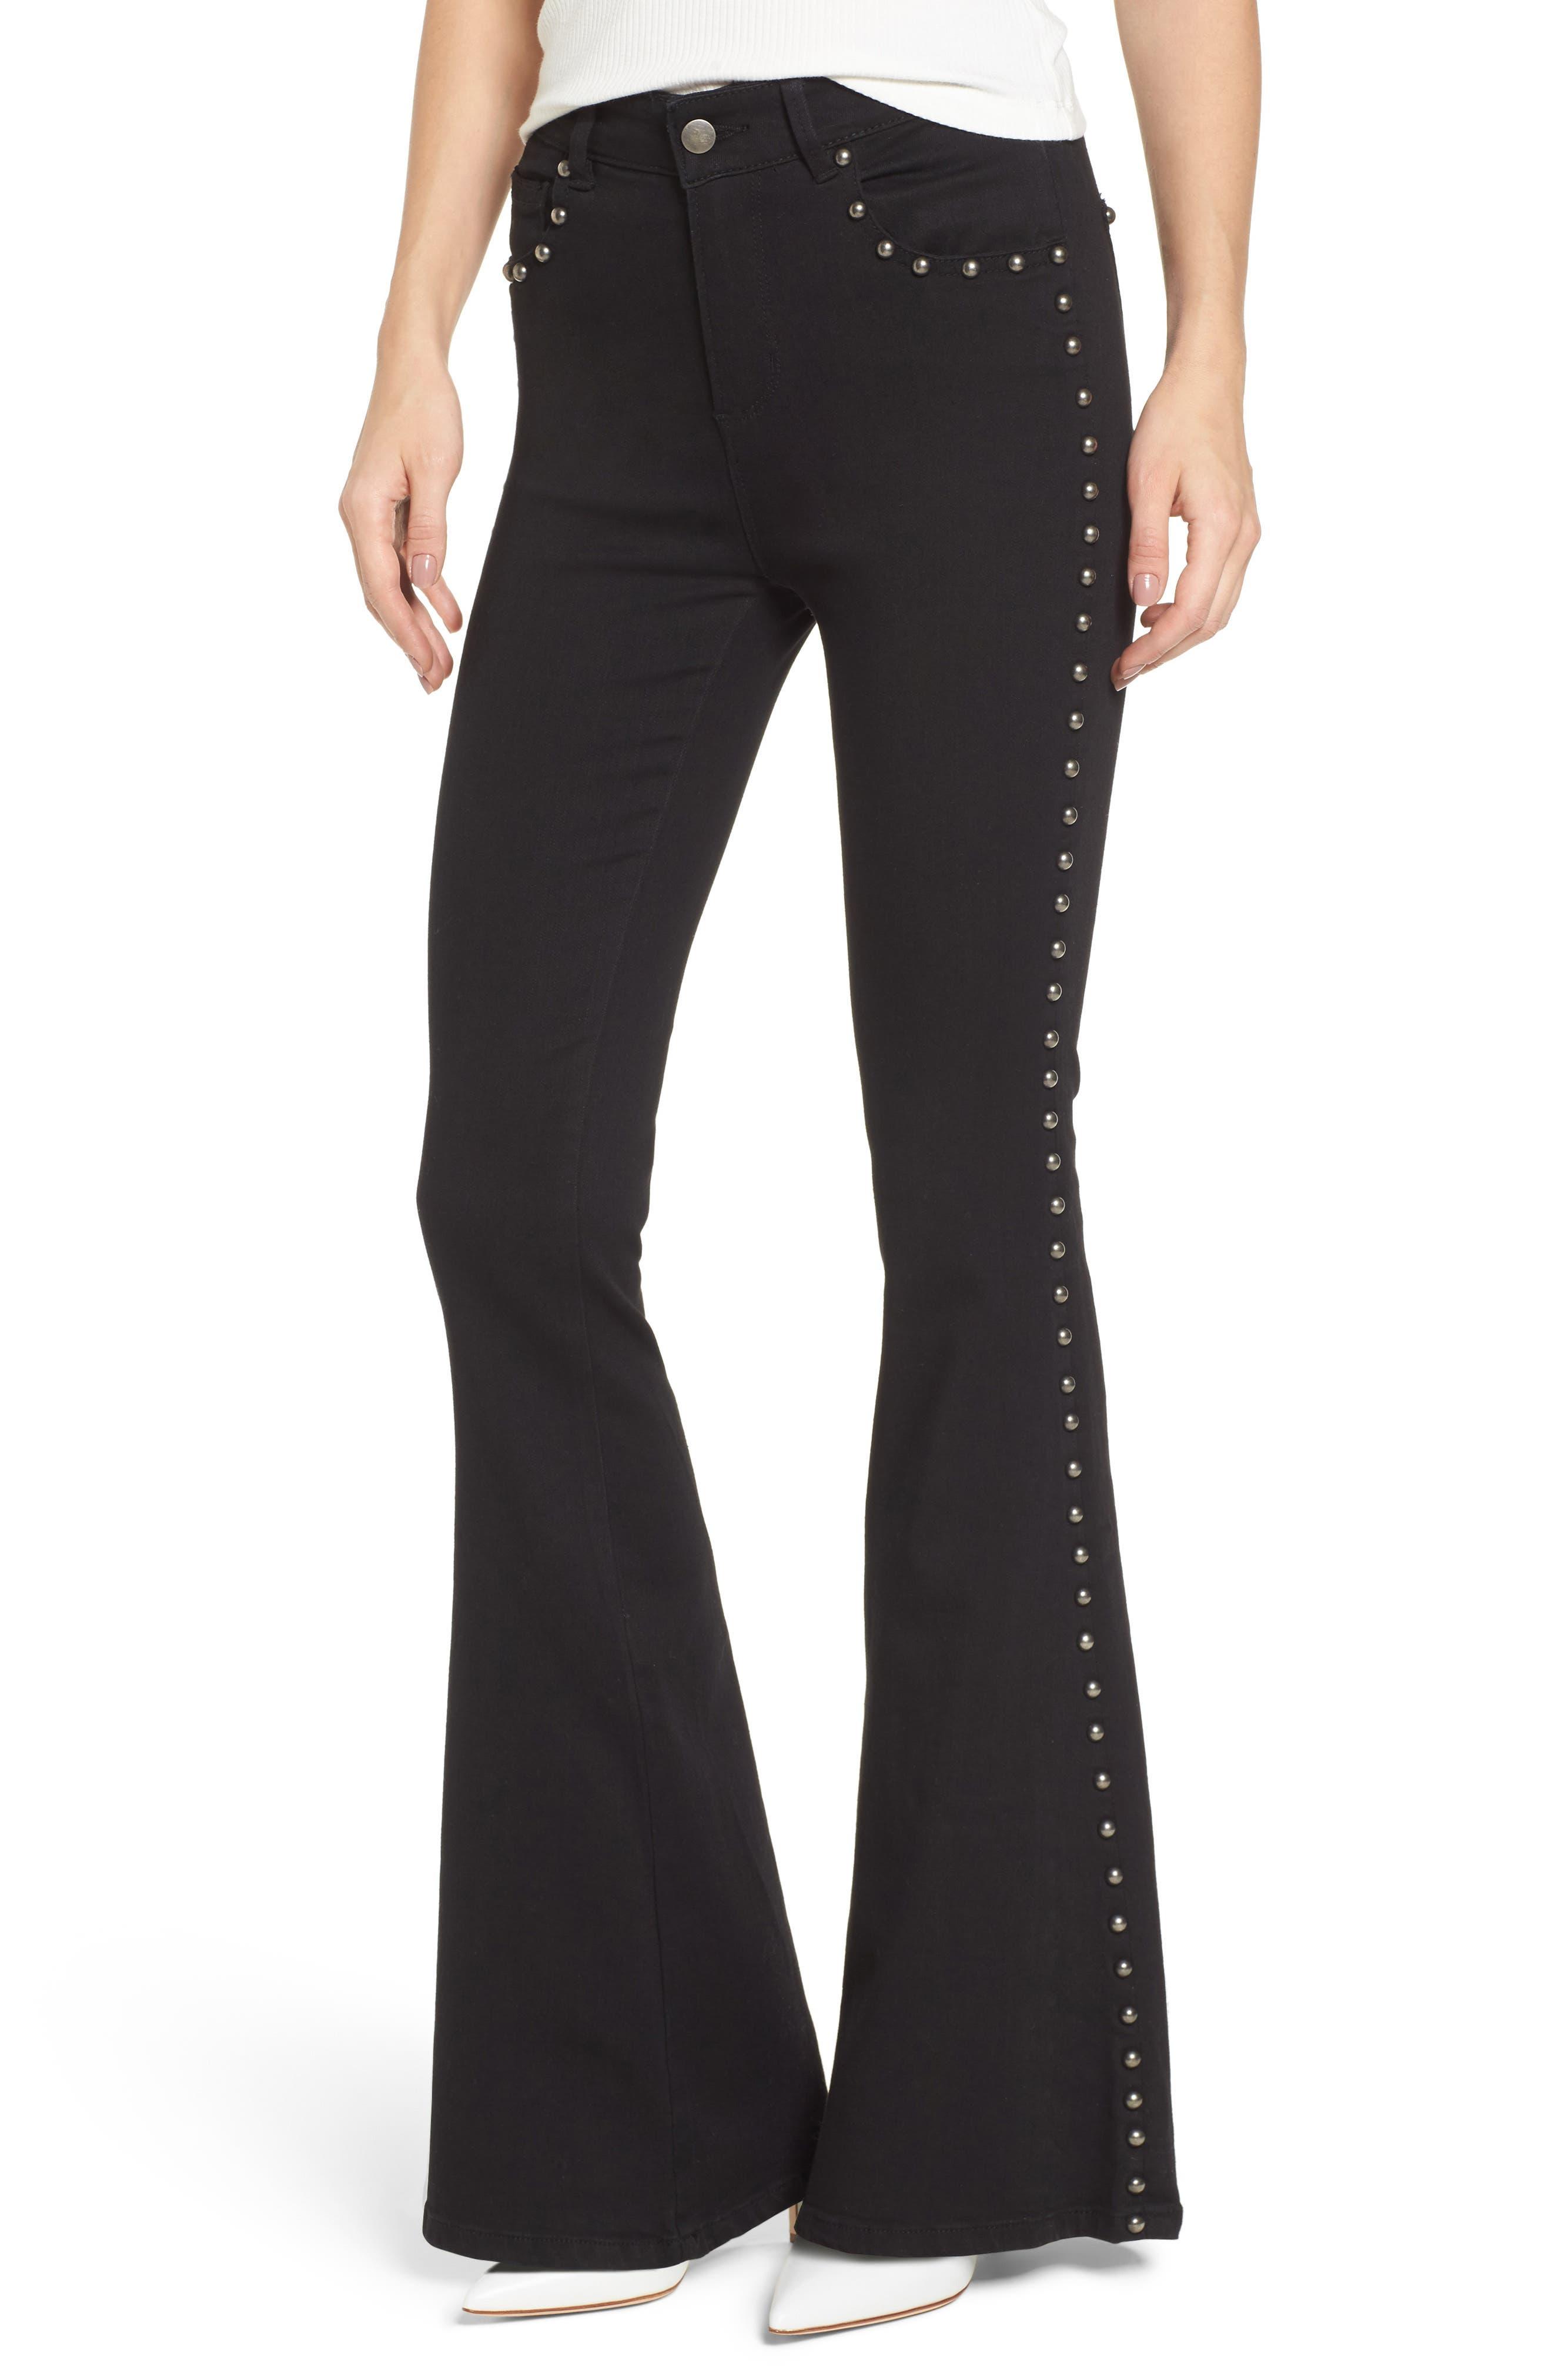 Alternate Image 1 Selected - AFRM Stud Flare Jeans